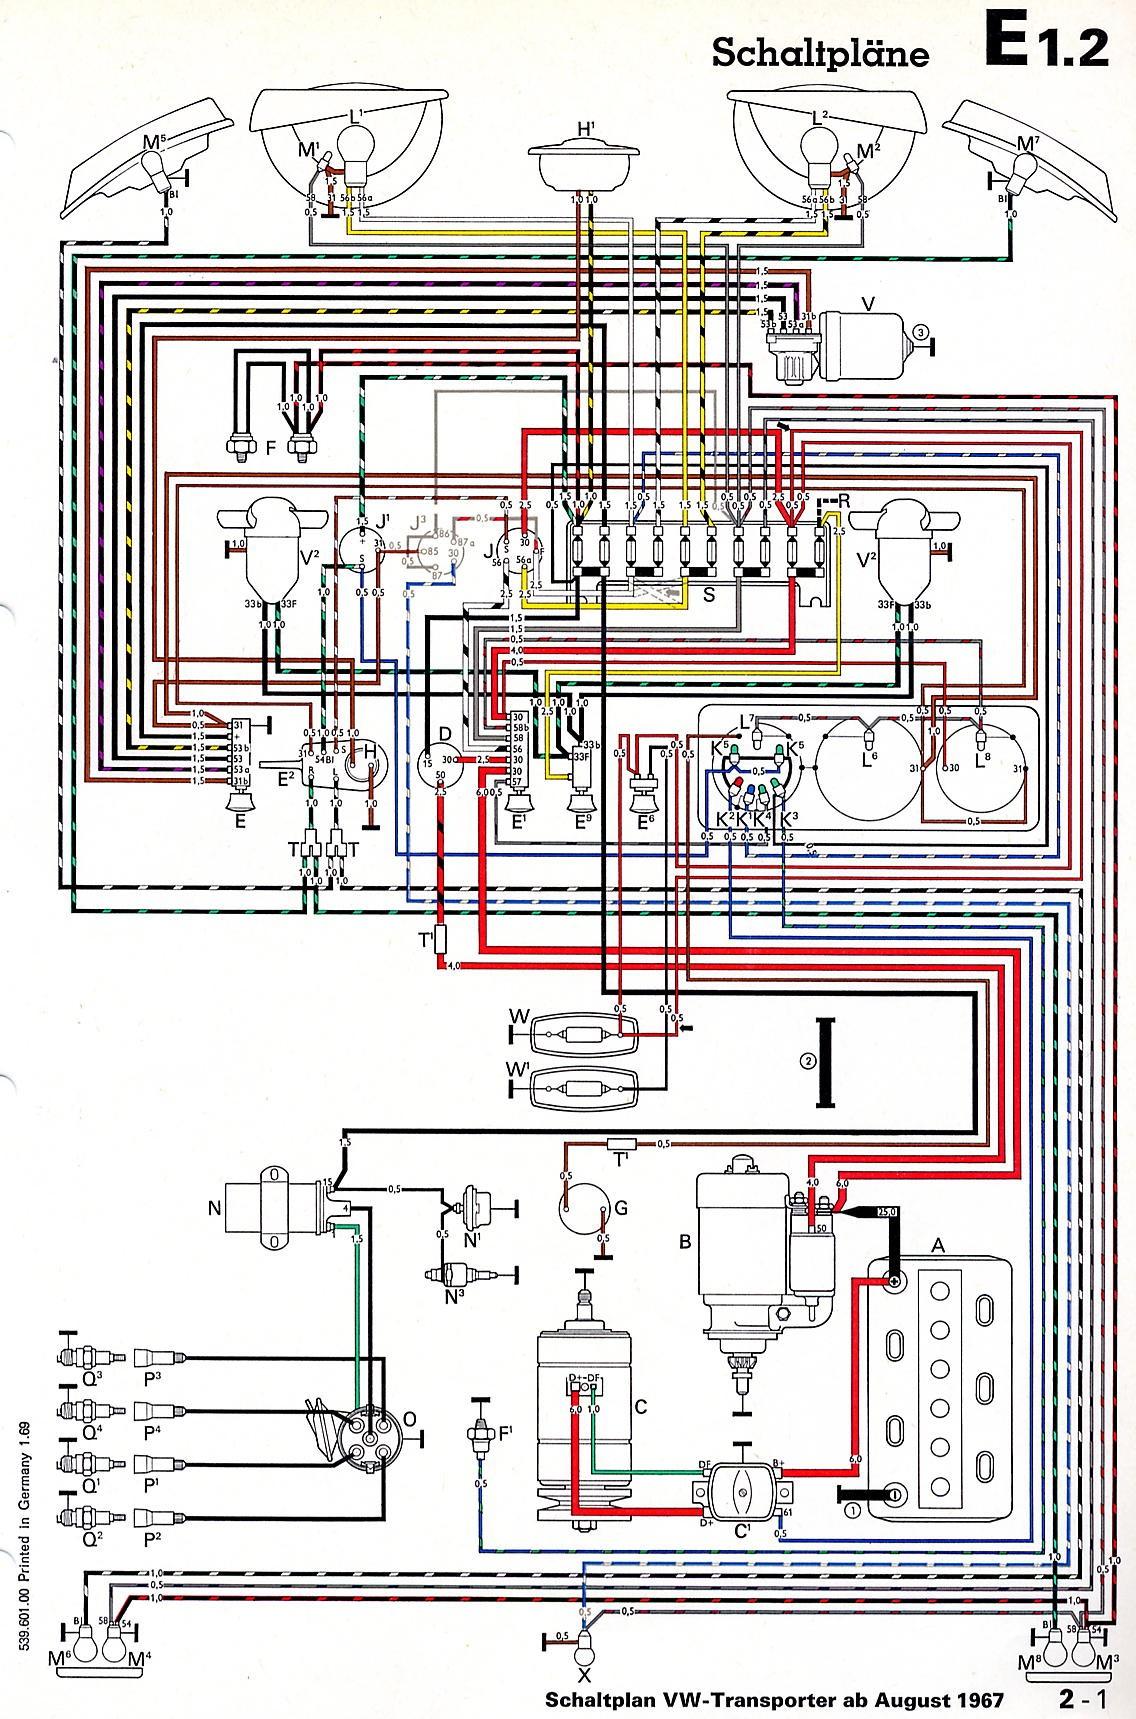 2000 Vw Beetle Parts Diagram 2000 Volkswagen Pat Fuse Box Diagram Also 1961 Cadillac for Sale Of 2000 Vw Beetle Parts Diagram